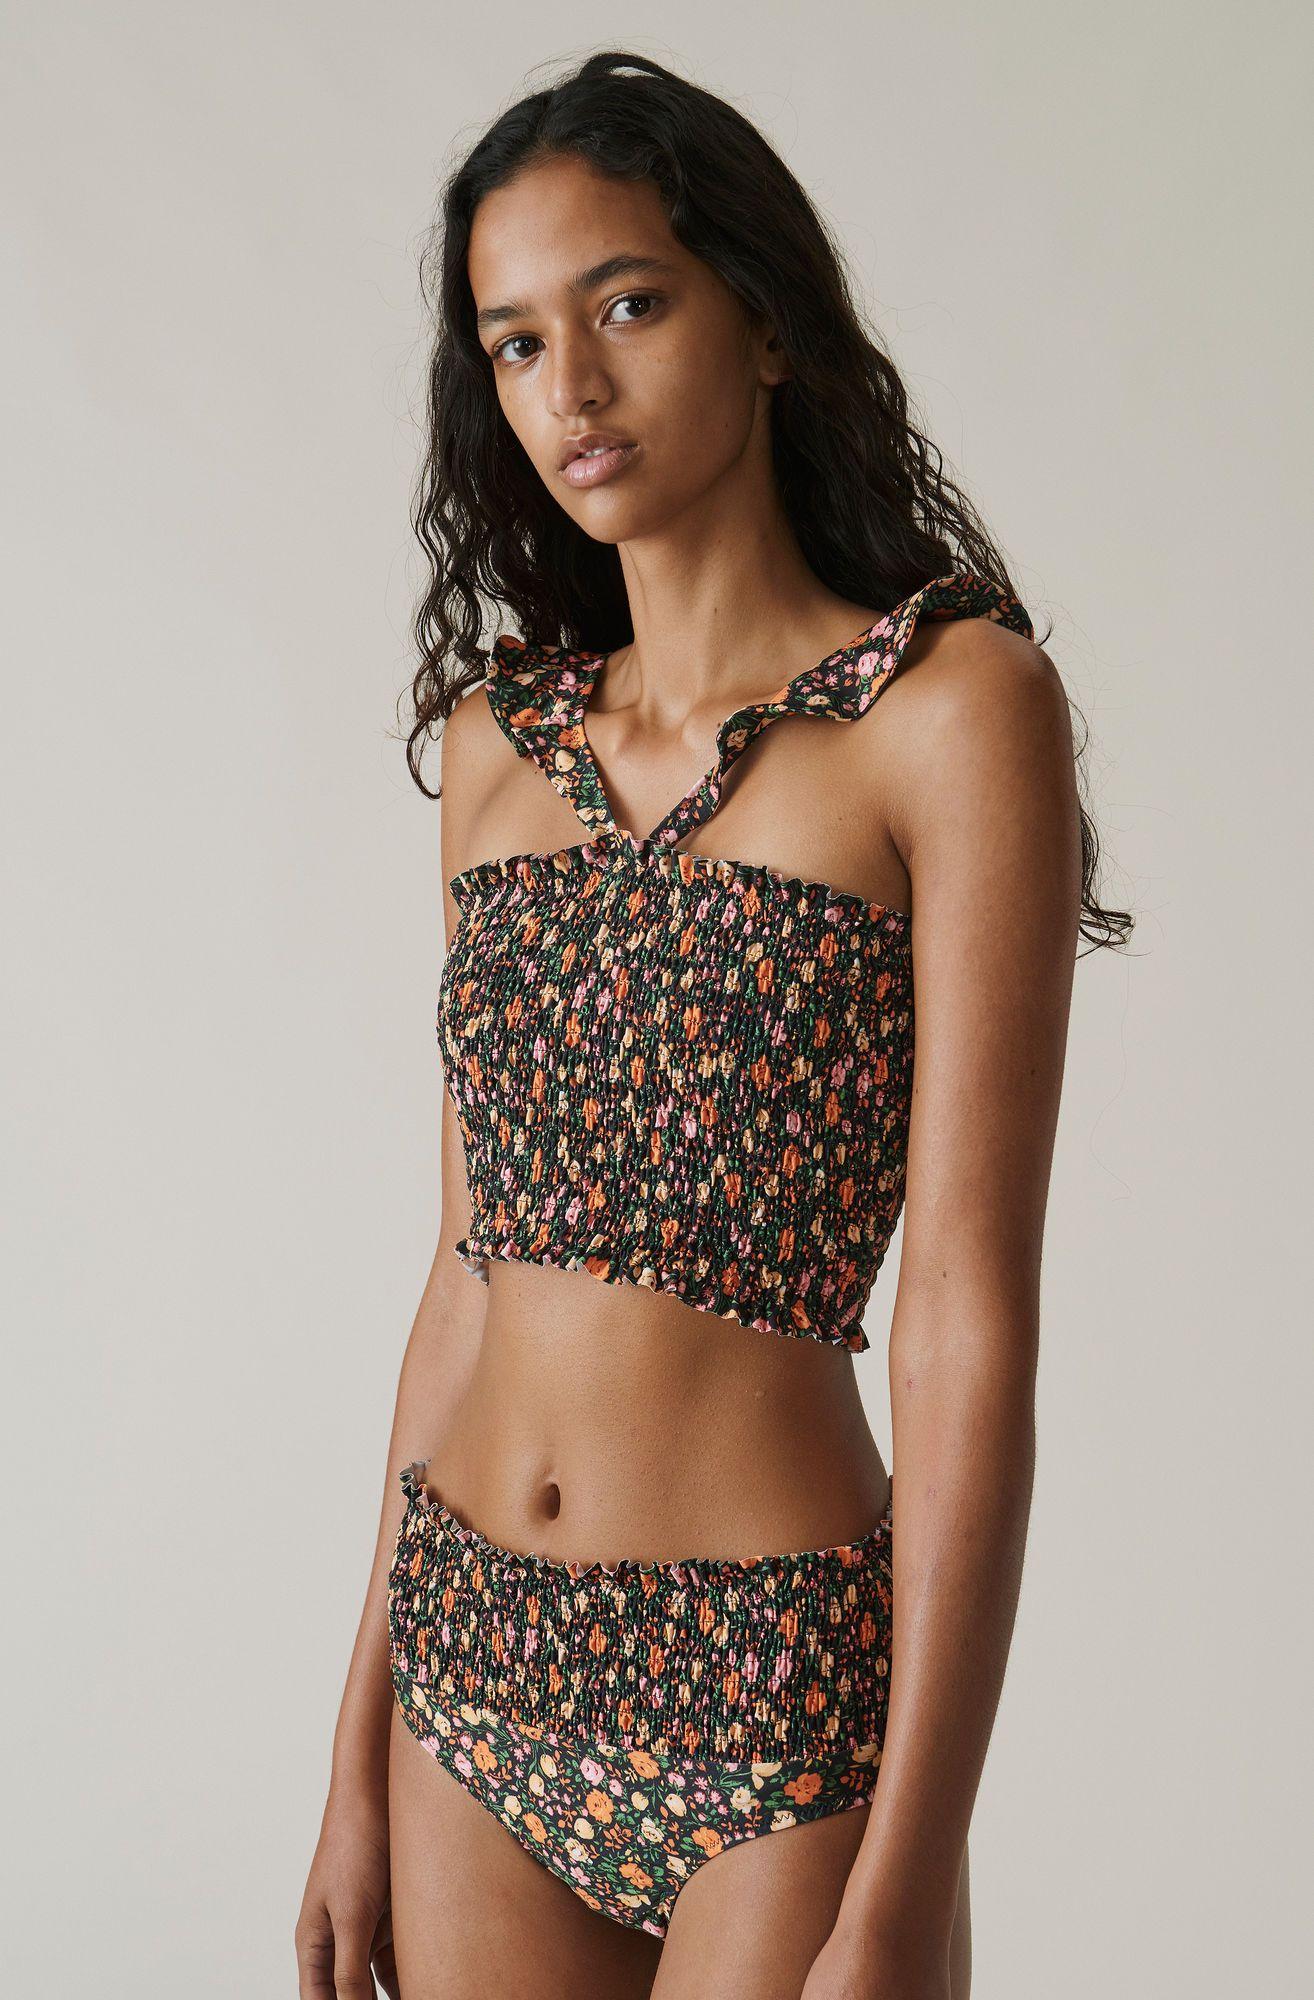 d88e3900de Ipanema Swimwear Bikini, Multicolour, hi-res   Style Buys Ideas ...